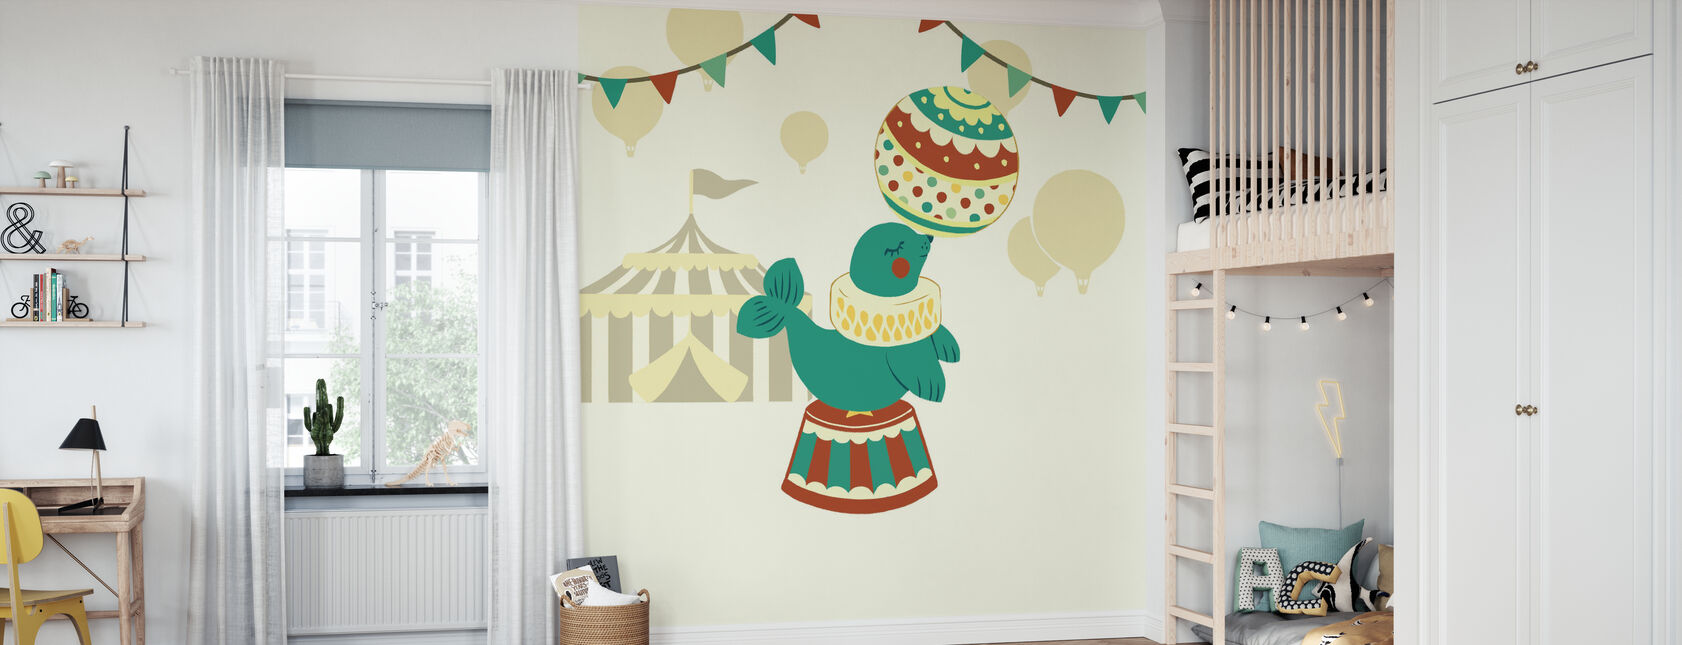 Little Circus Seal - Wallpaper - Kids Room